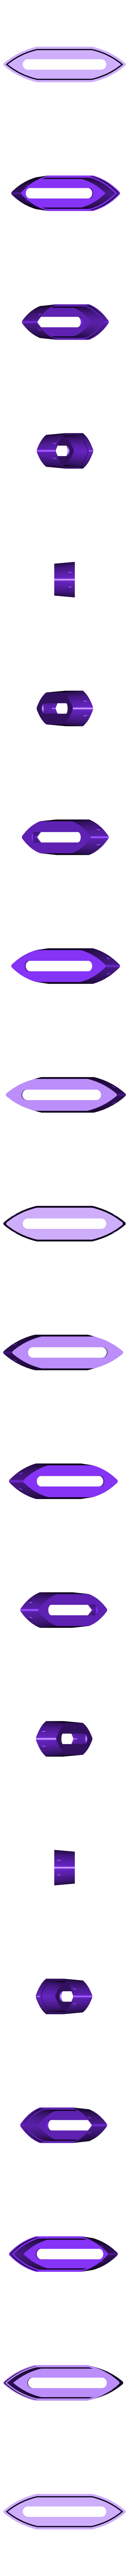 5_Buck_Boat_Top_002.STL Download free STL file 5 BUCK BOAT! • 3D printing object, Tarnliare